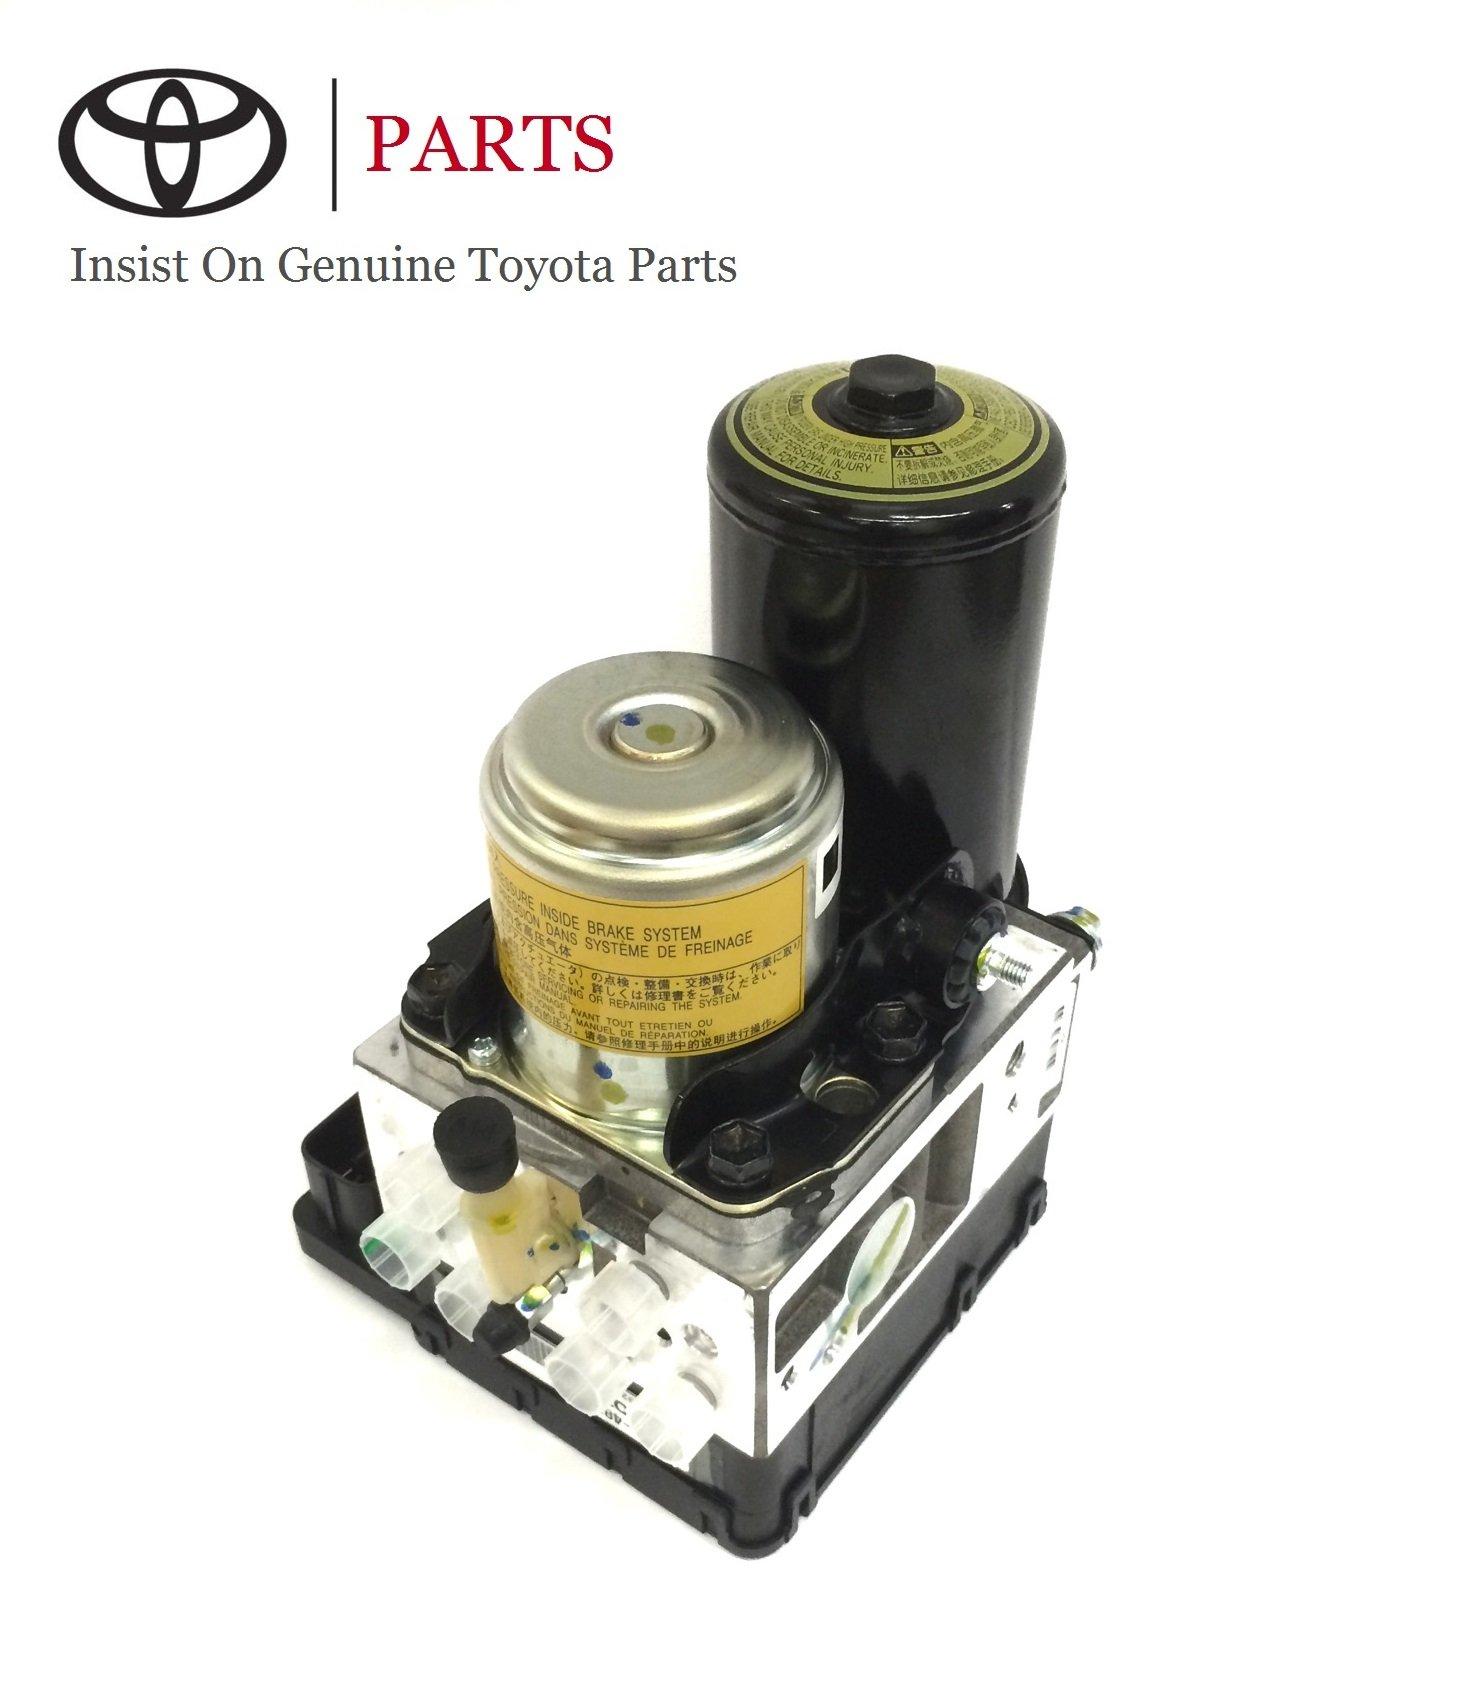 Toyota 44050-48191, ABS Modulator by Toyota